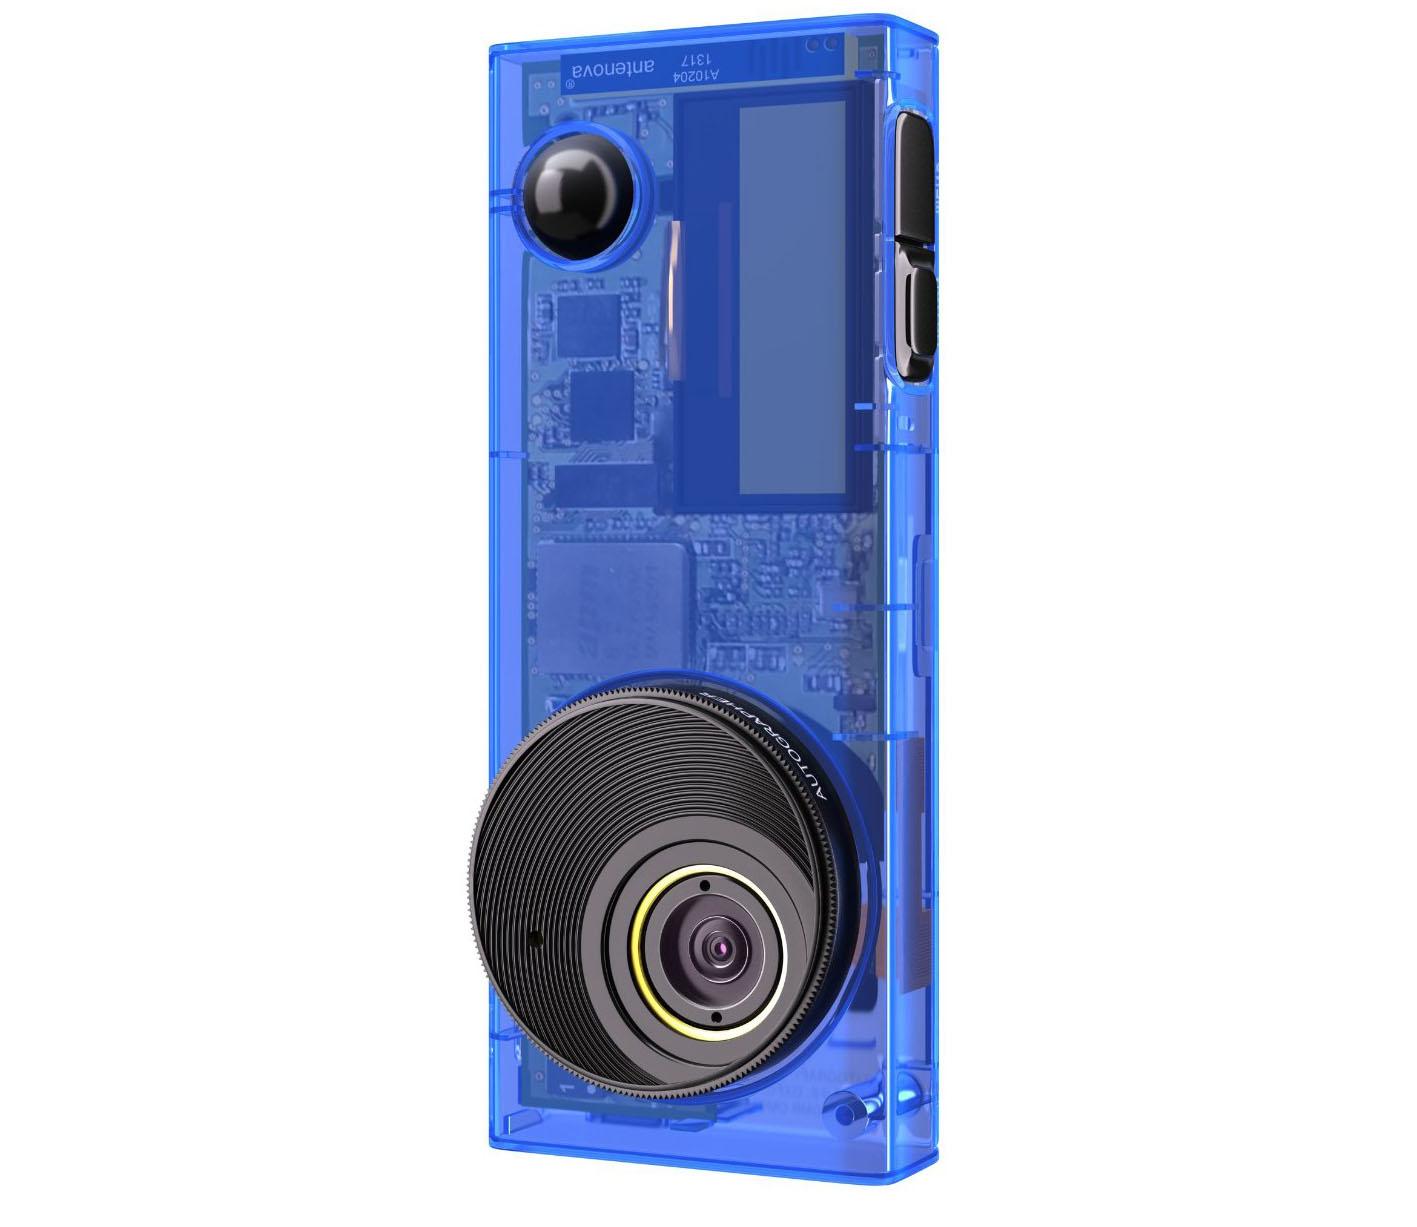 wearable camera, wearables, digital camera